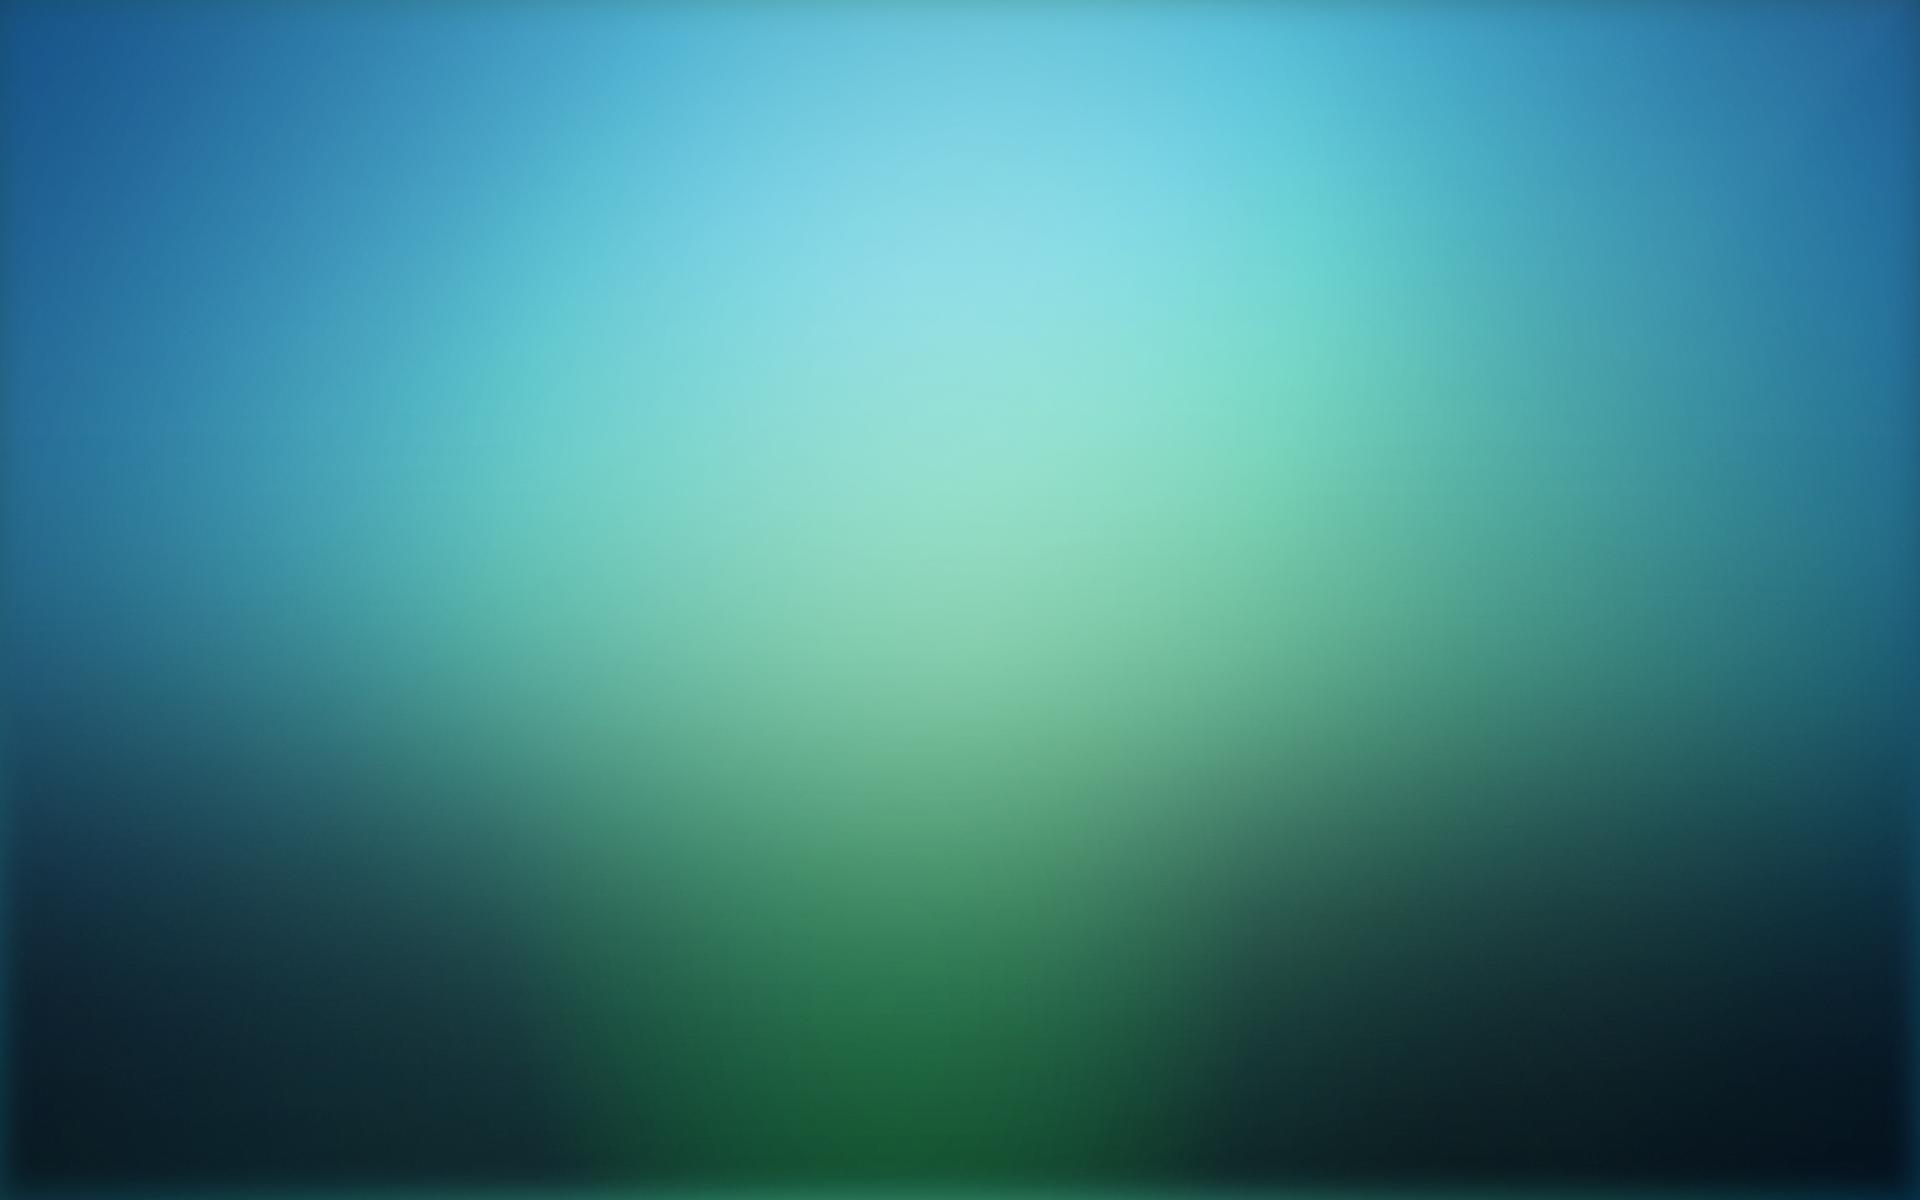 blue blur 2 wallpaper - photo #16